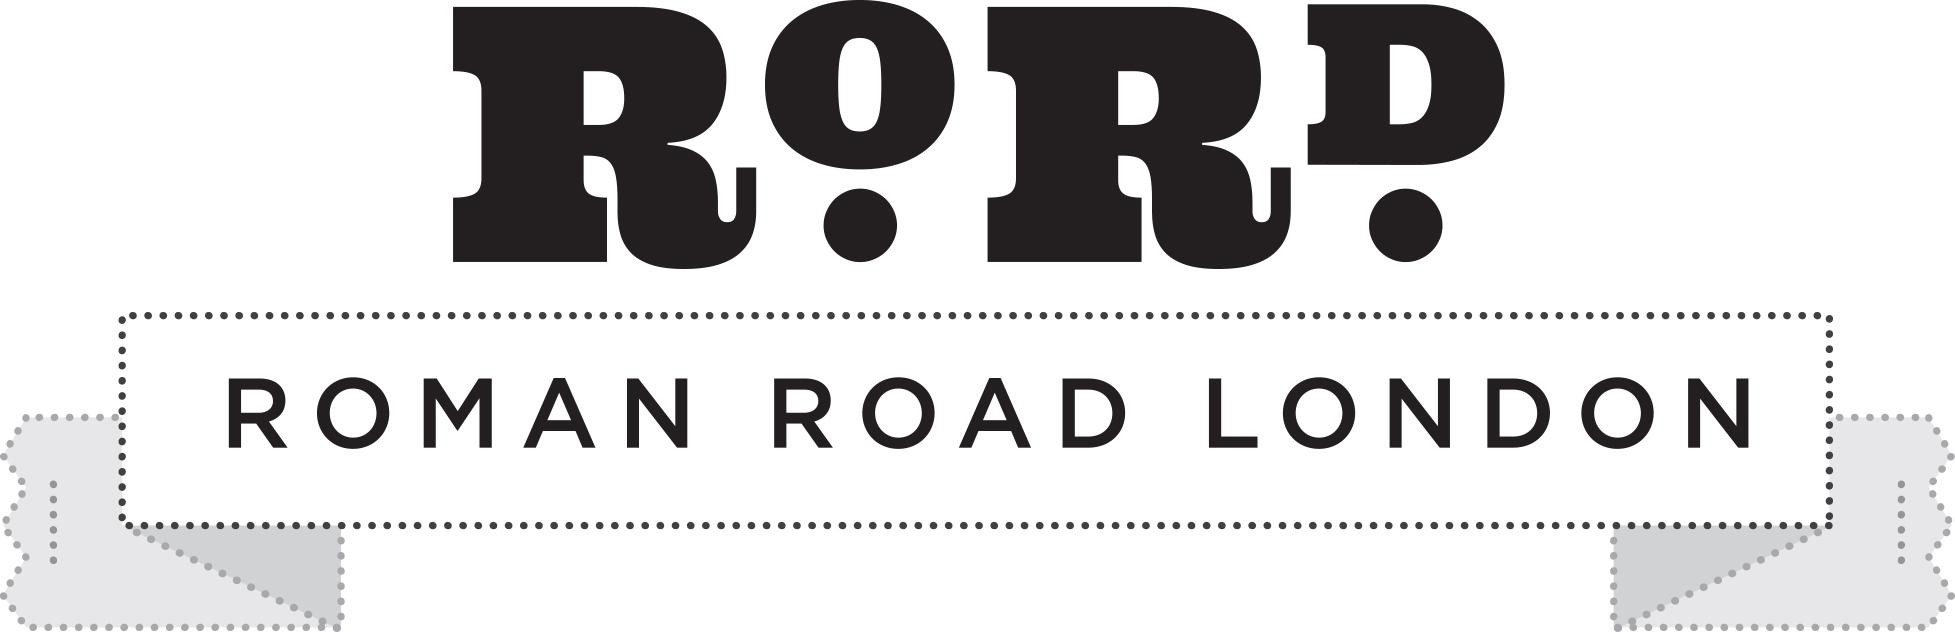 ROMAN_ROAD_LONDON_LOGO_RIBBON